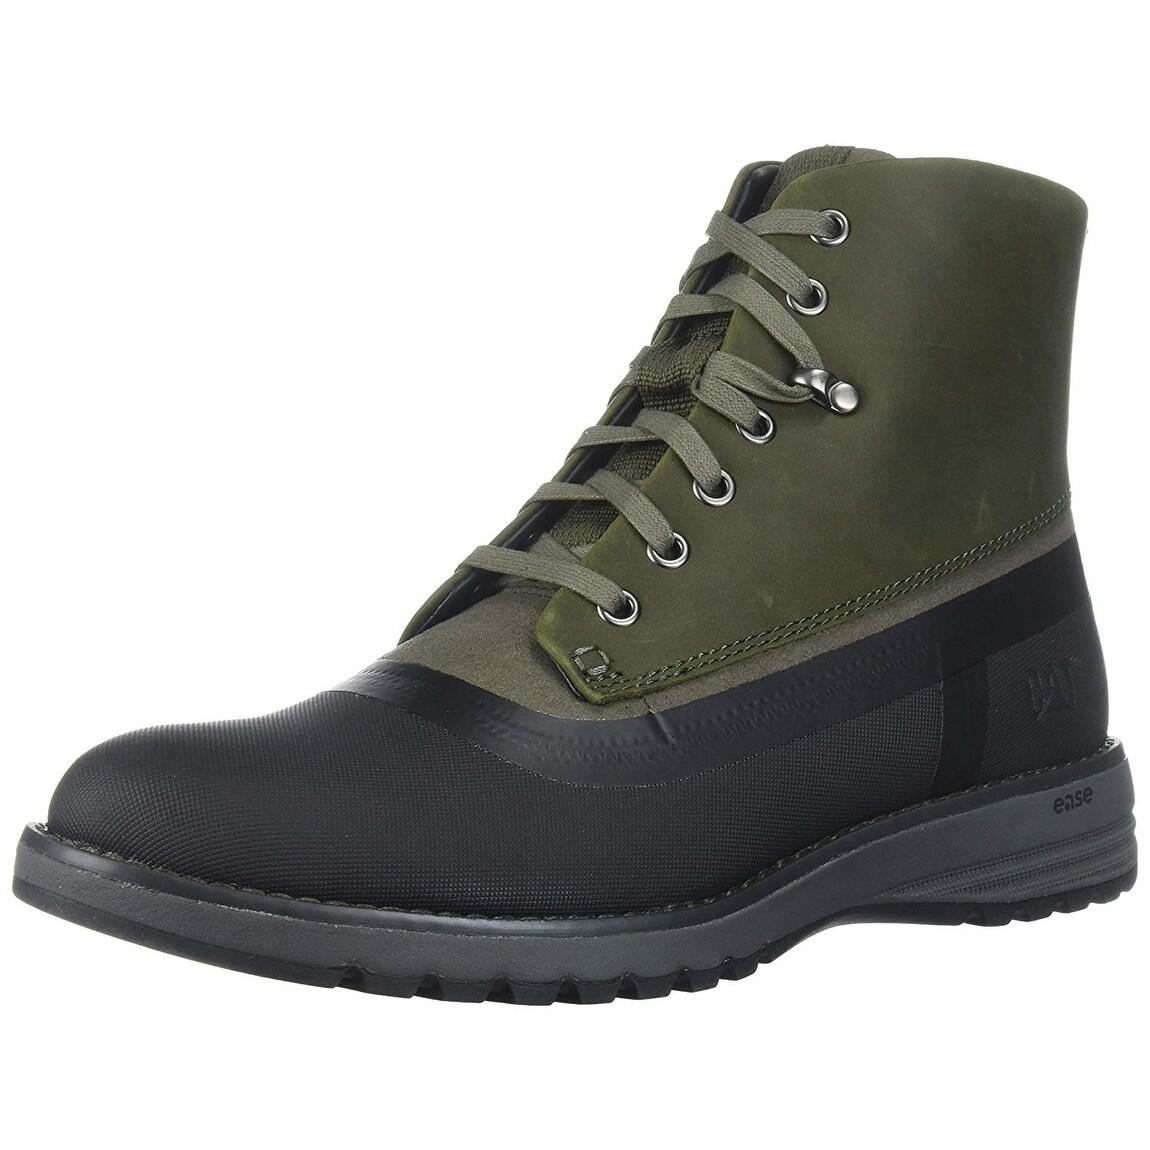 74f72ea96f35e Buy Caterpillar Men's Boots Online at Overstock | Our Best Men's Shoes Deals